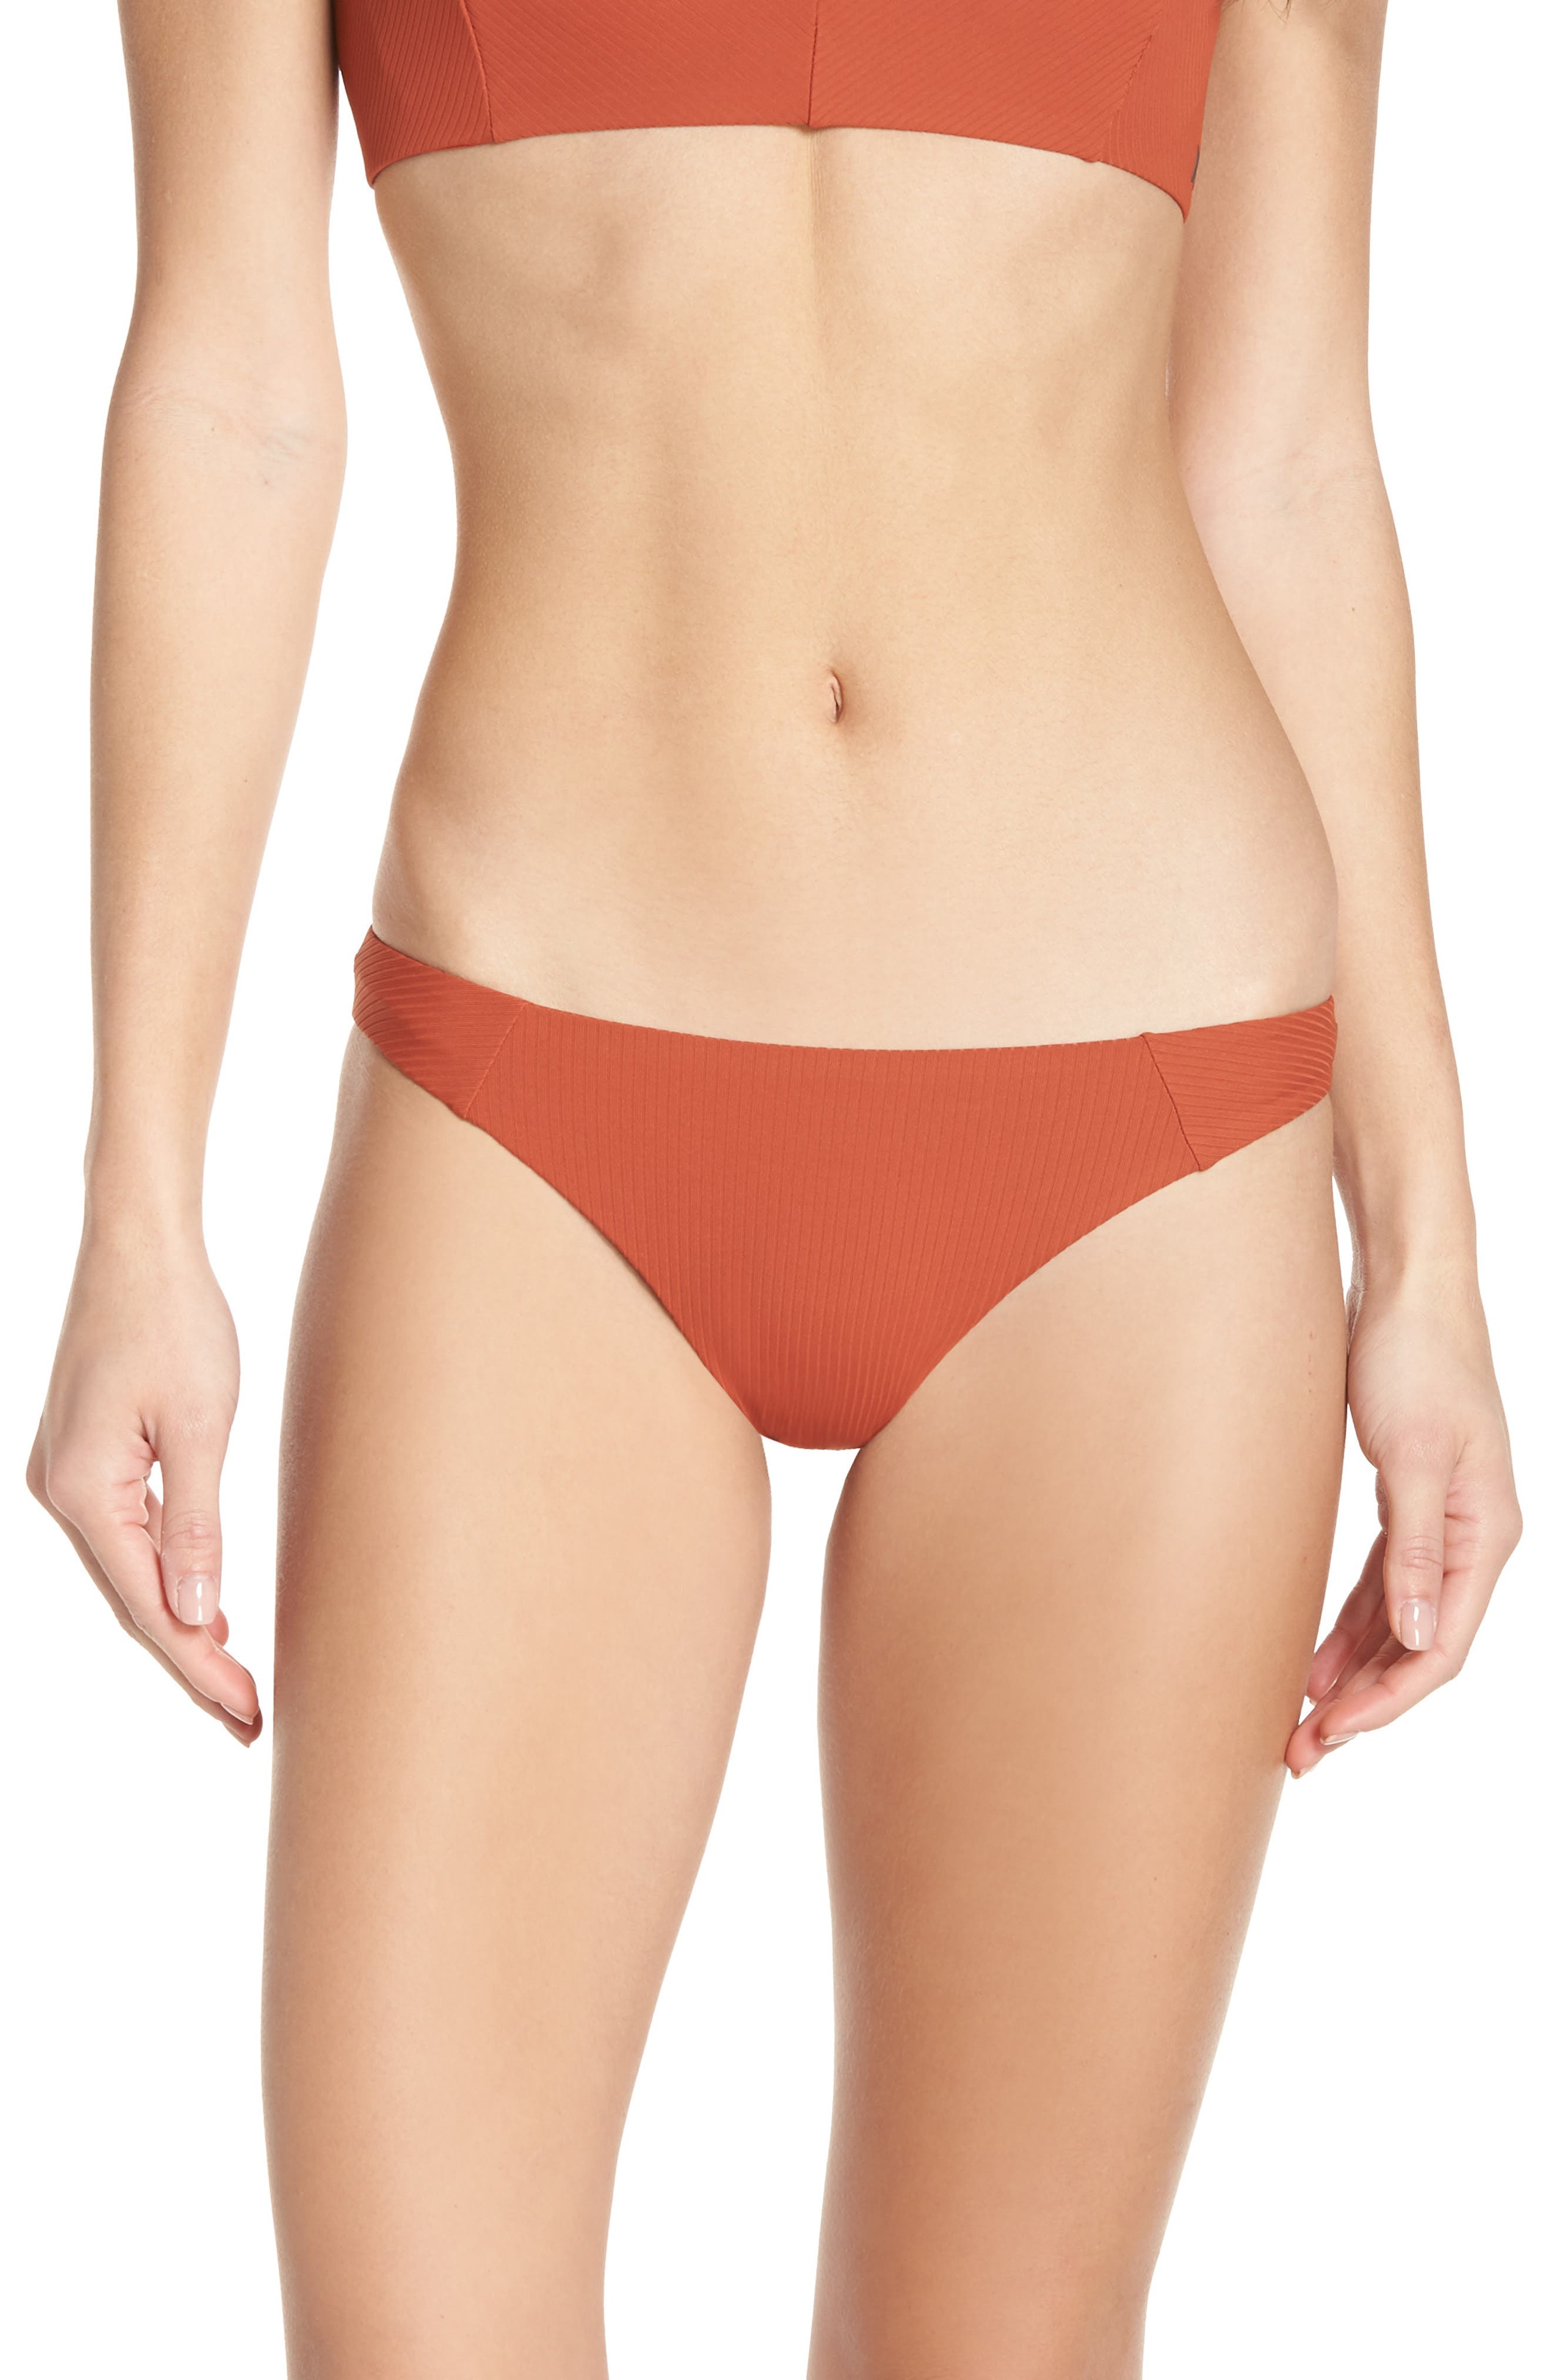 Hurley Quick-Dry Surf Bikini Bottoms, Orange